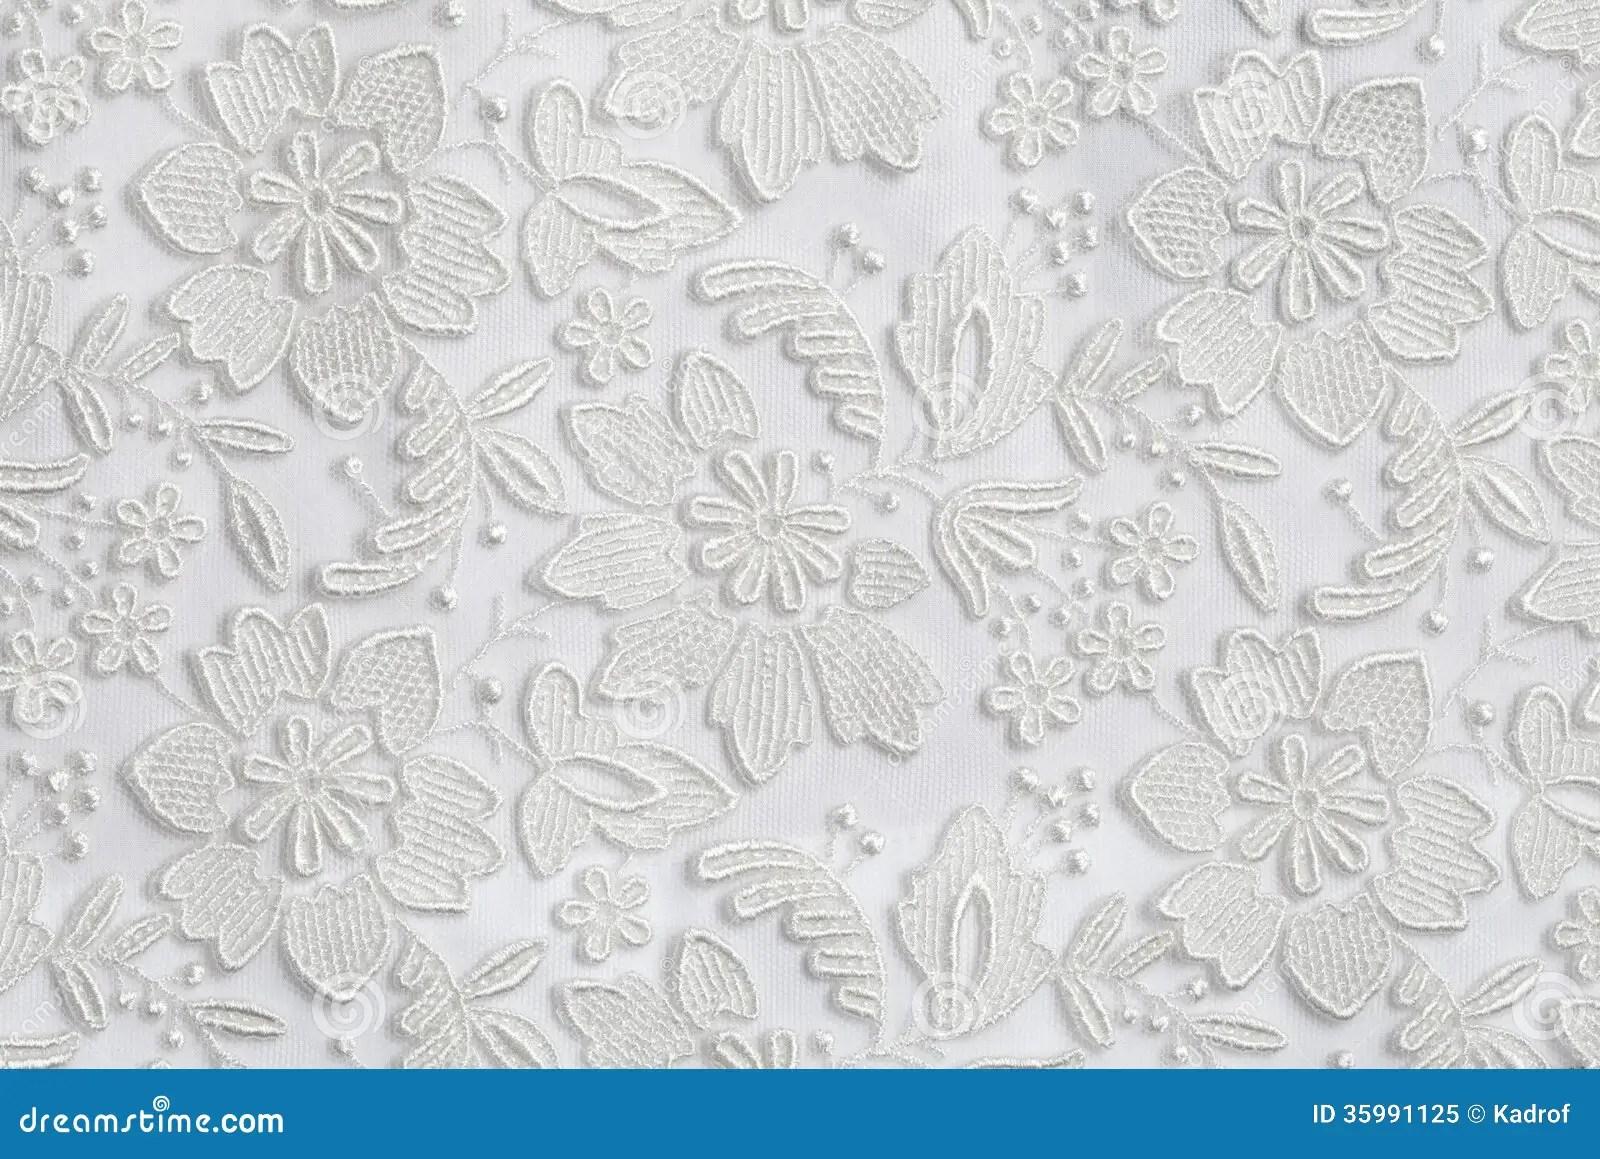 Satin Weave Design